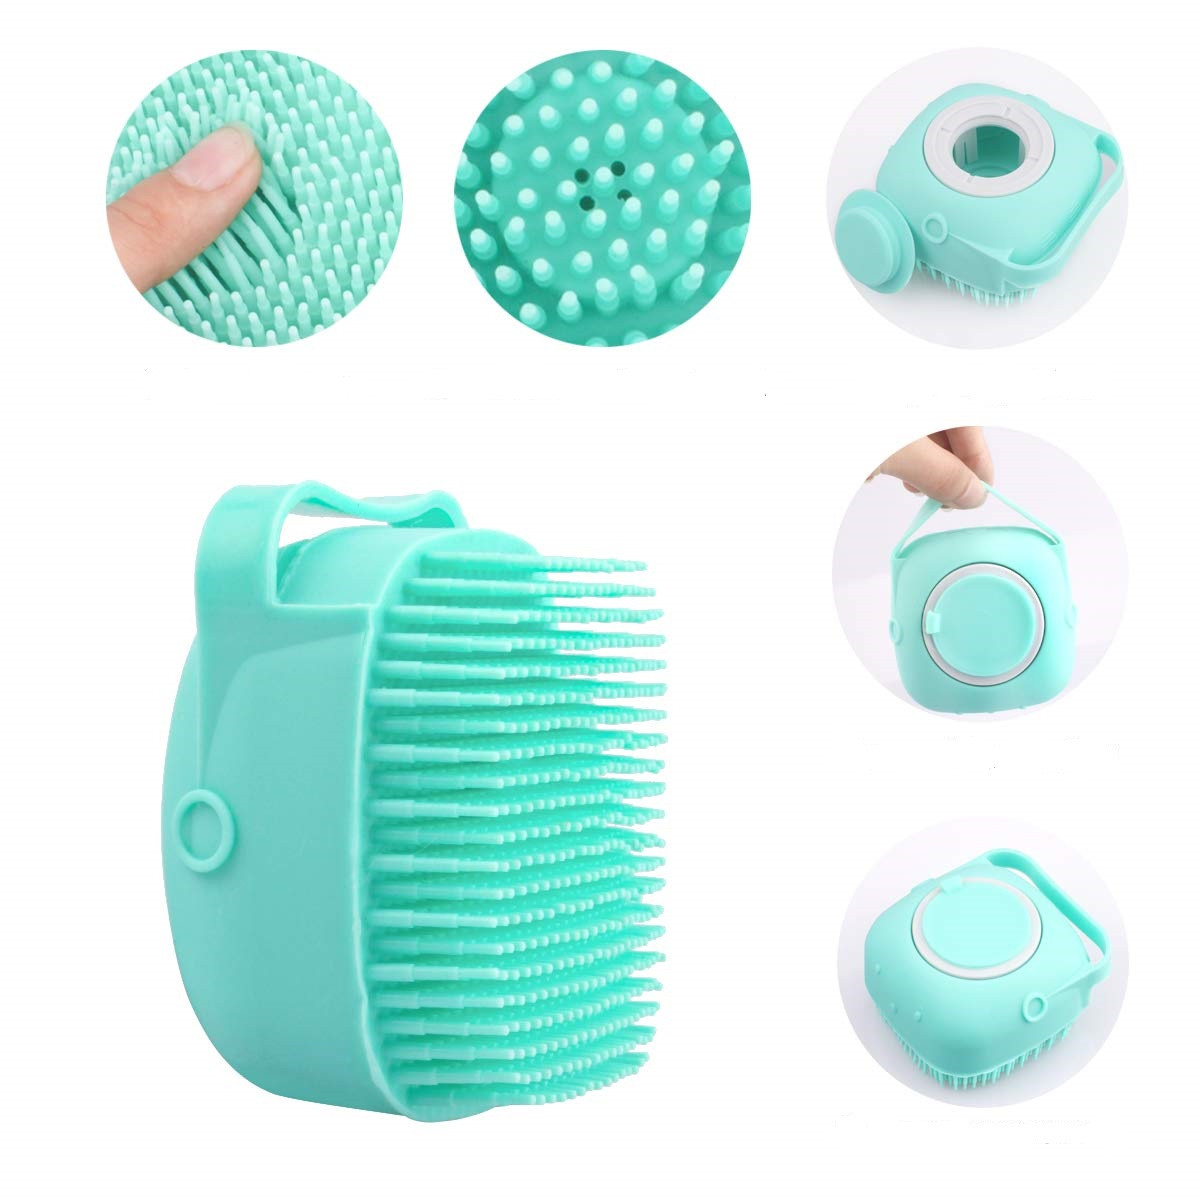 ОПТ Силіконова масажна щітка для ванни Silicone Massage Bath Brush